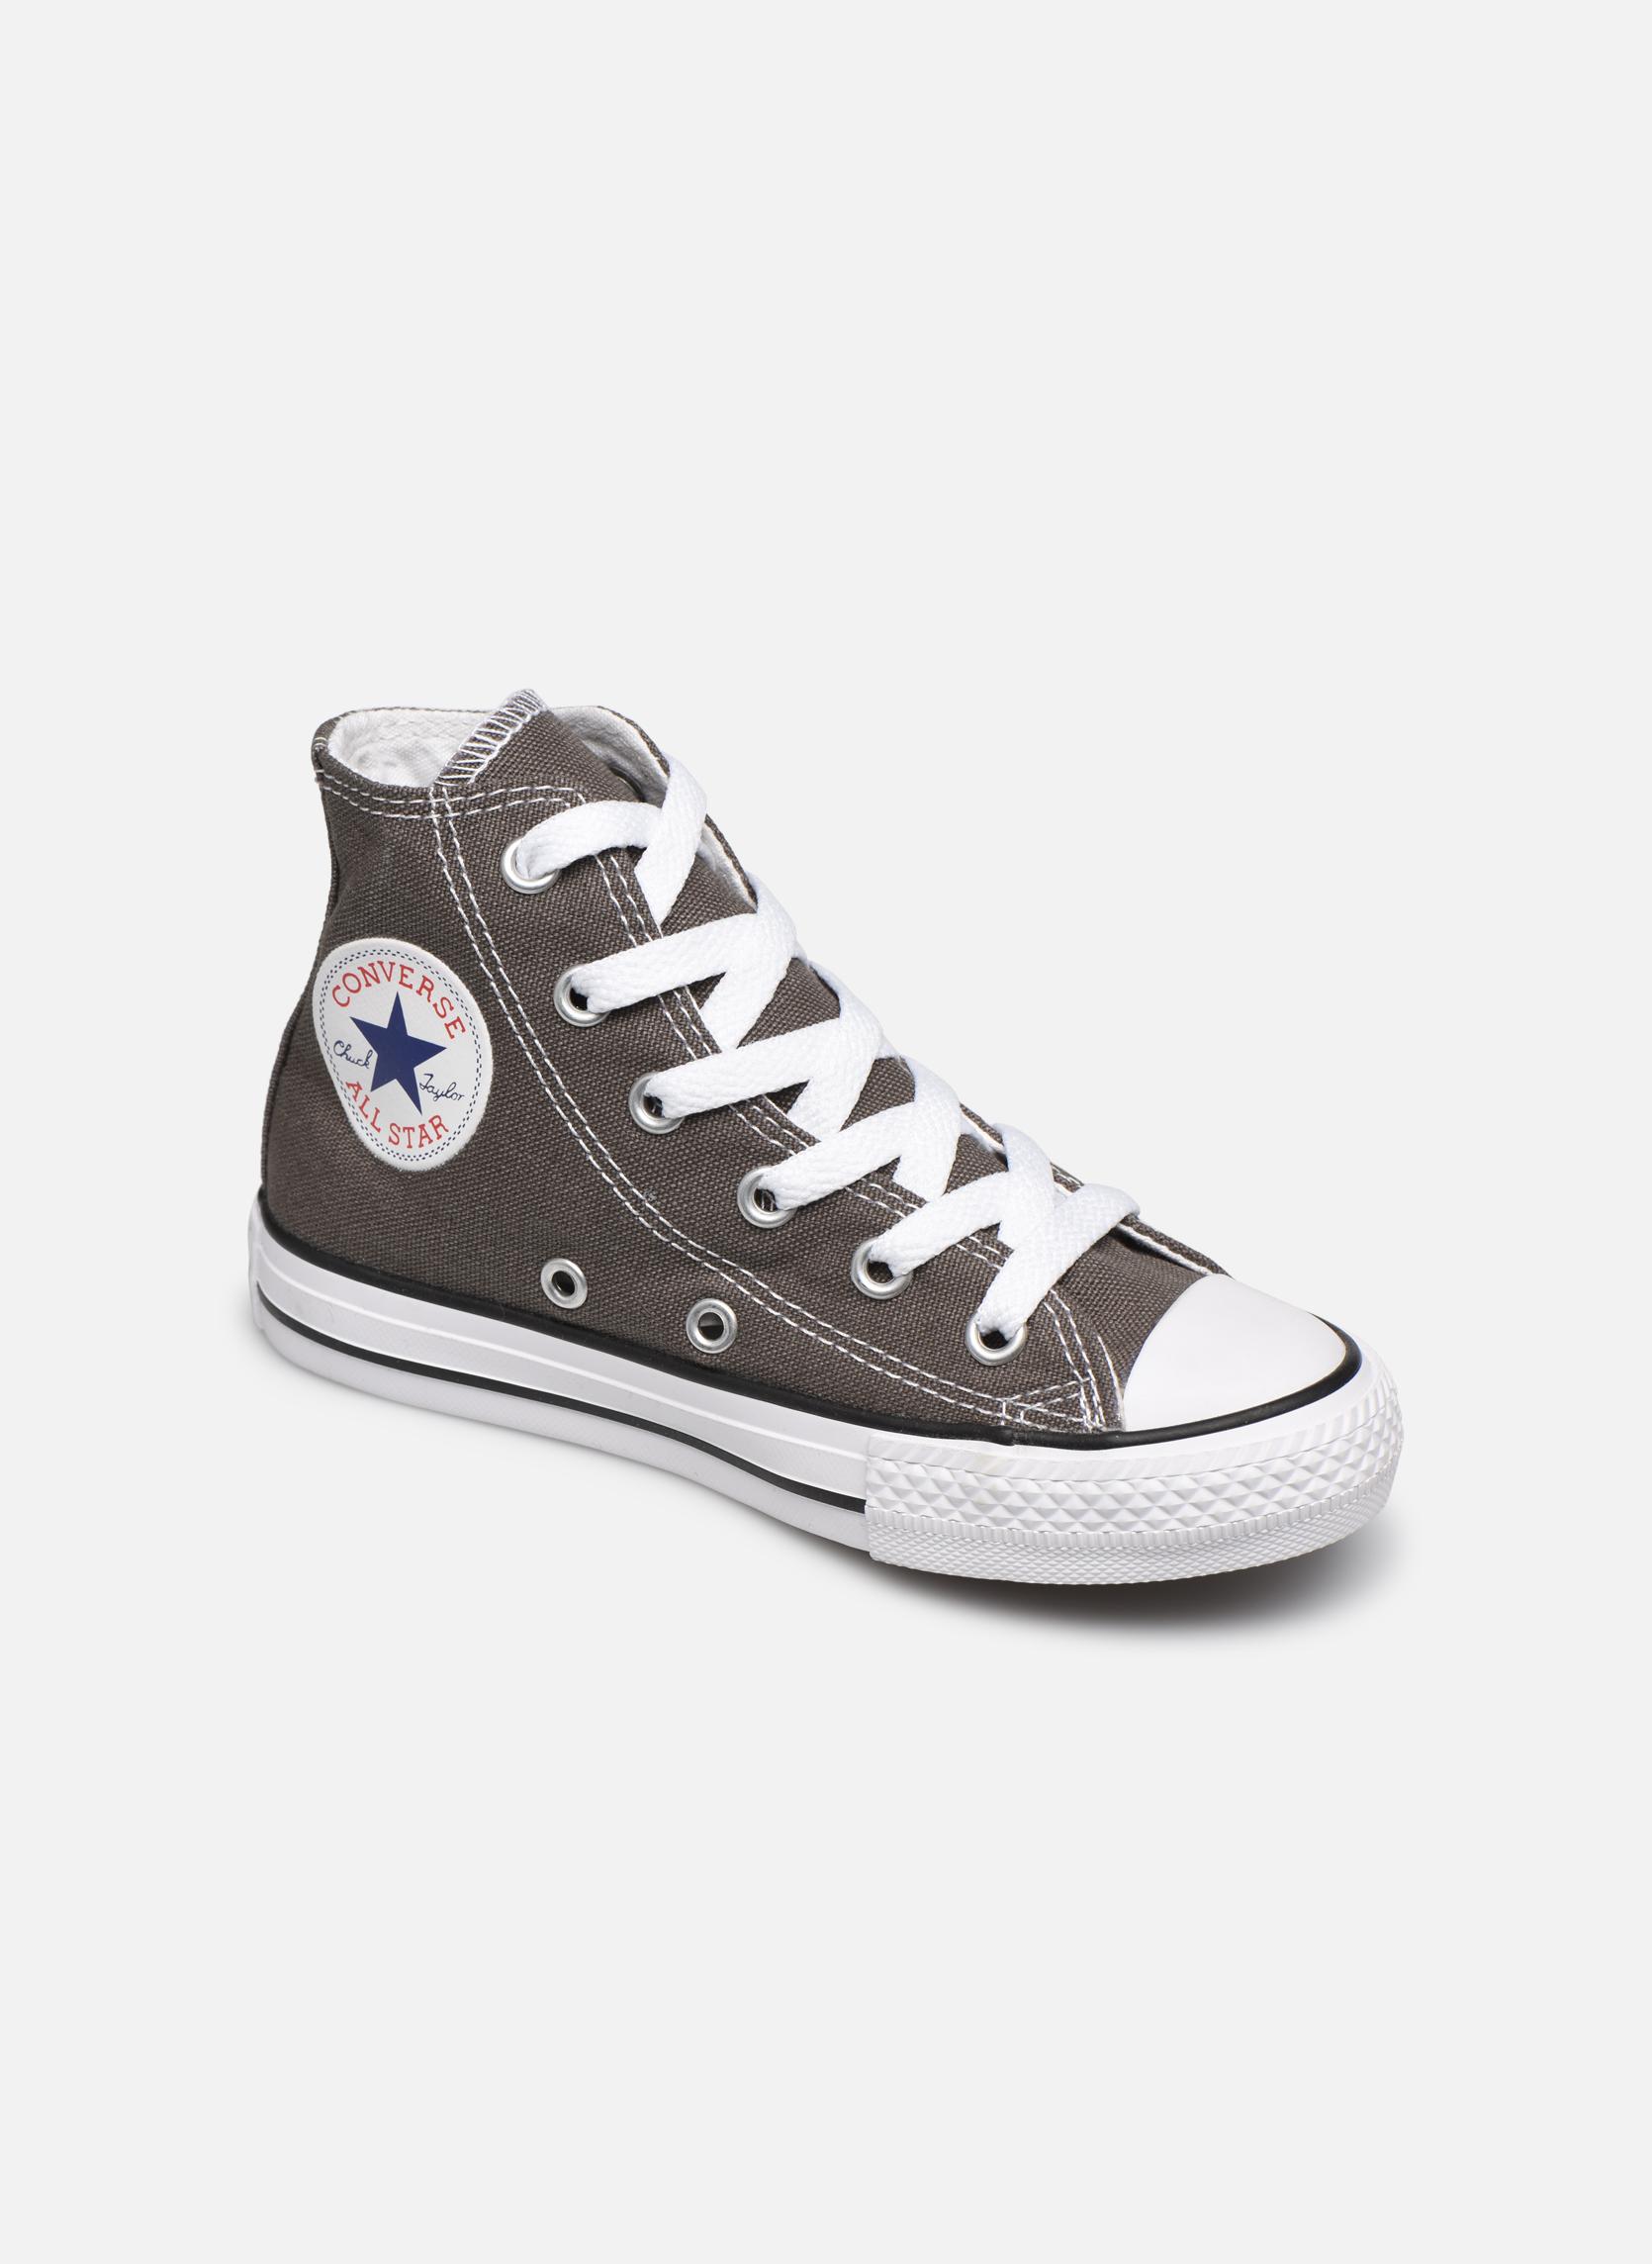 Sneaker Kinder Chuck Taylor All Star Sp Hi